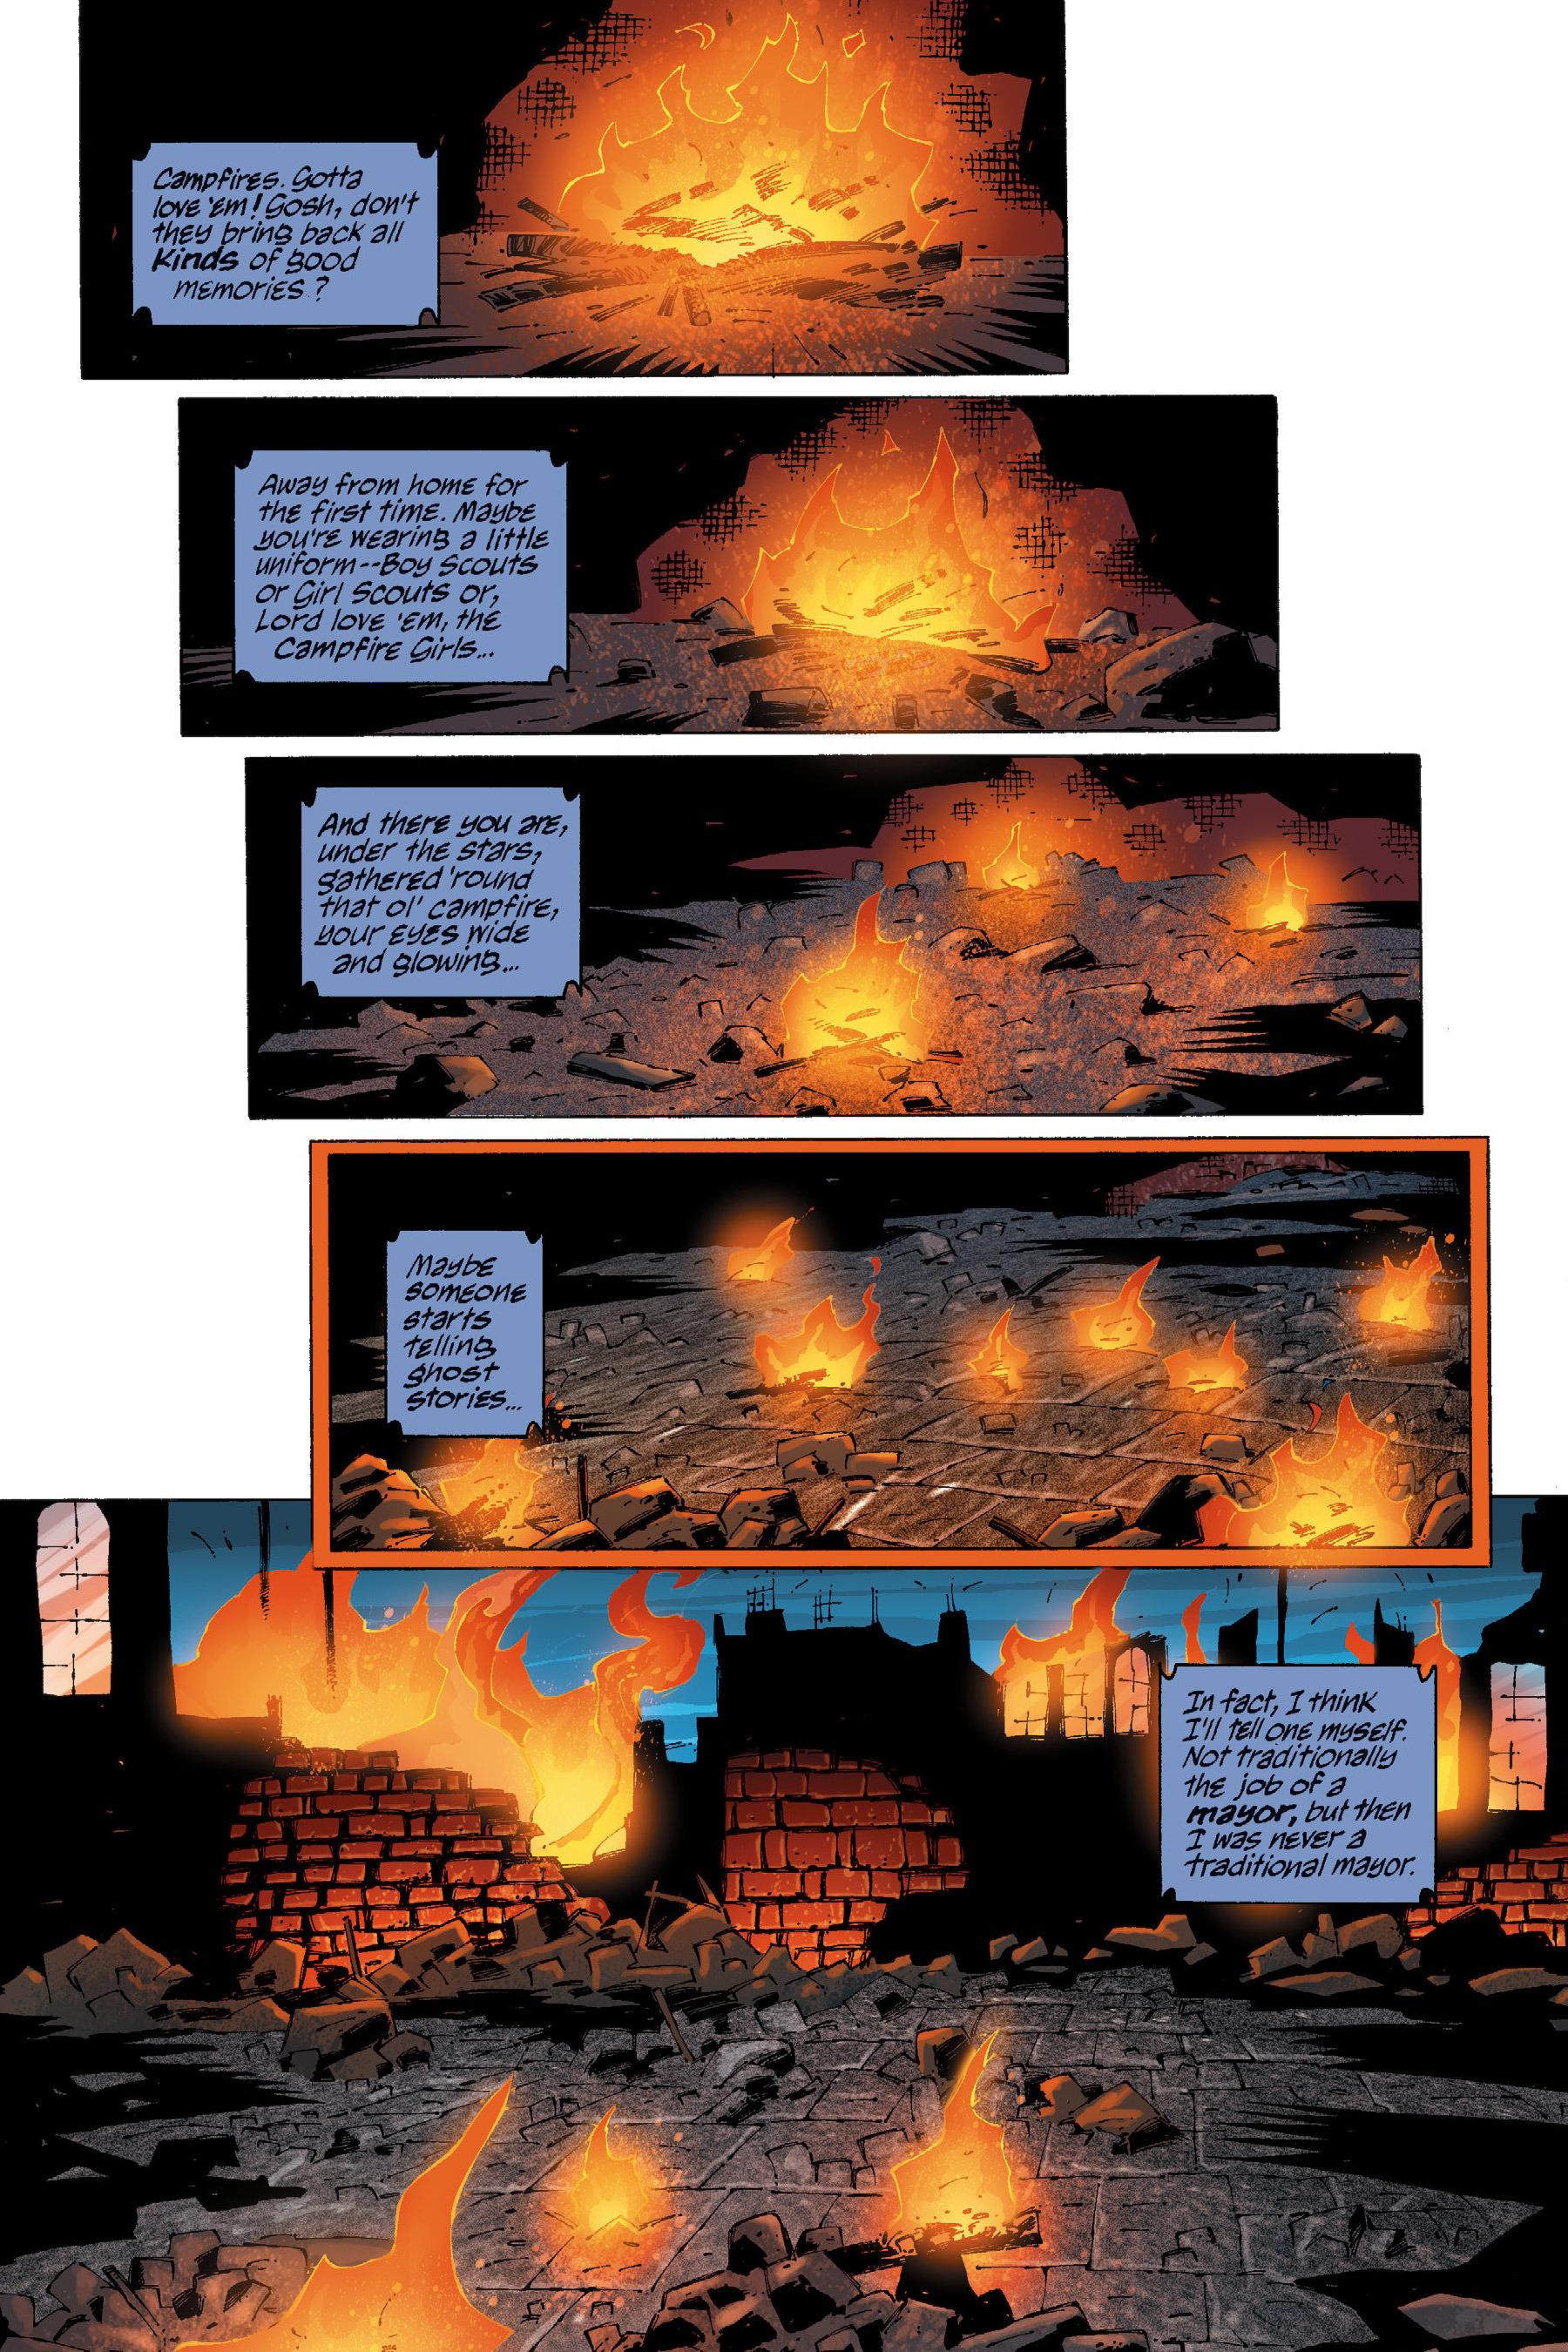 Read online Buffy the Vampire Slayer: Omnibus comic -  Issue # TPB 5 - 11